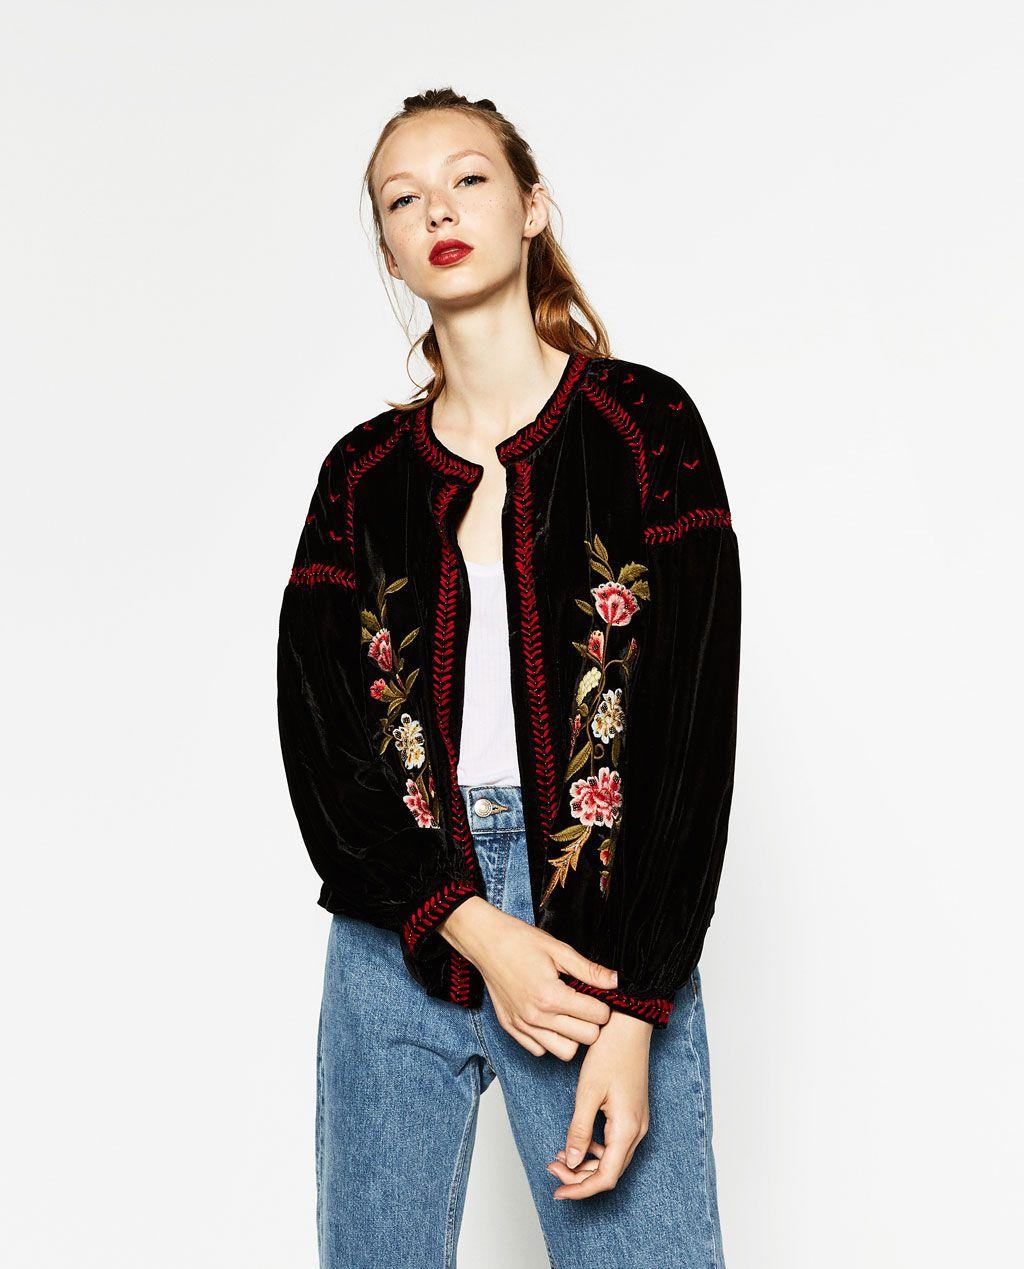 zara femme veste en velours brod e bordado pinterest terciopelo zara y chaquetas. Black Bedroom Furniture Sets. Home Design Ideas